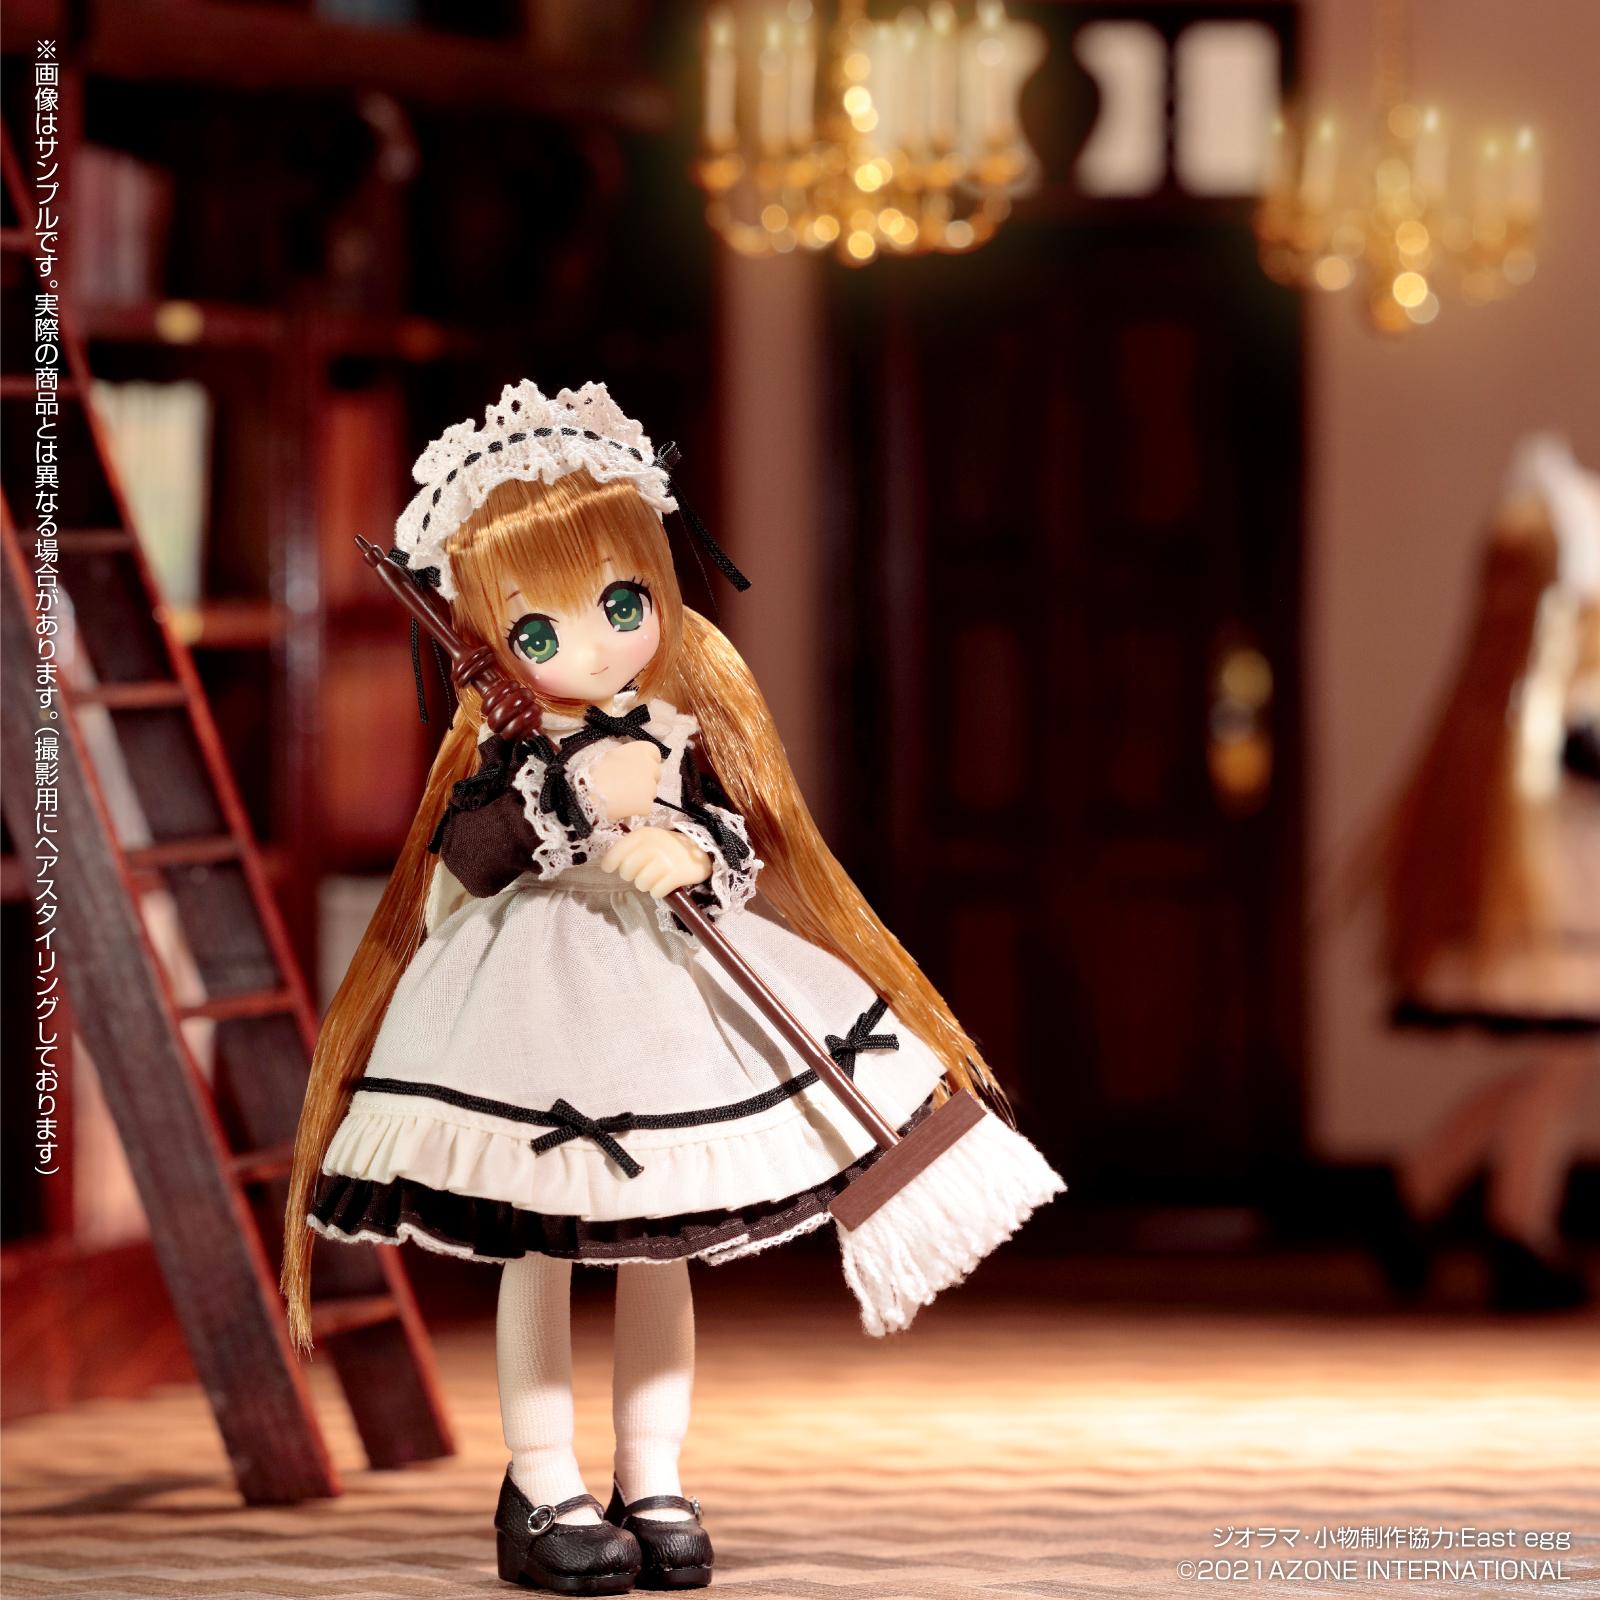 Lil'Fairy ~ちいさなお手伝いさん~『リプー 7th anniv.(ノーマル口ver.)』1/12 完成品ドール-011